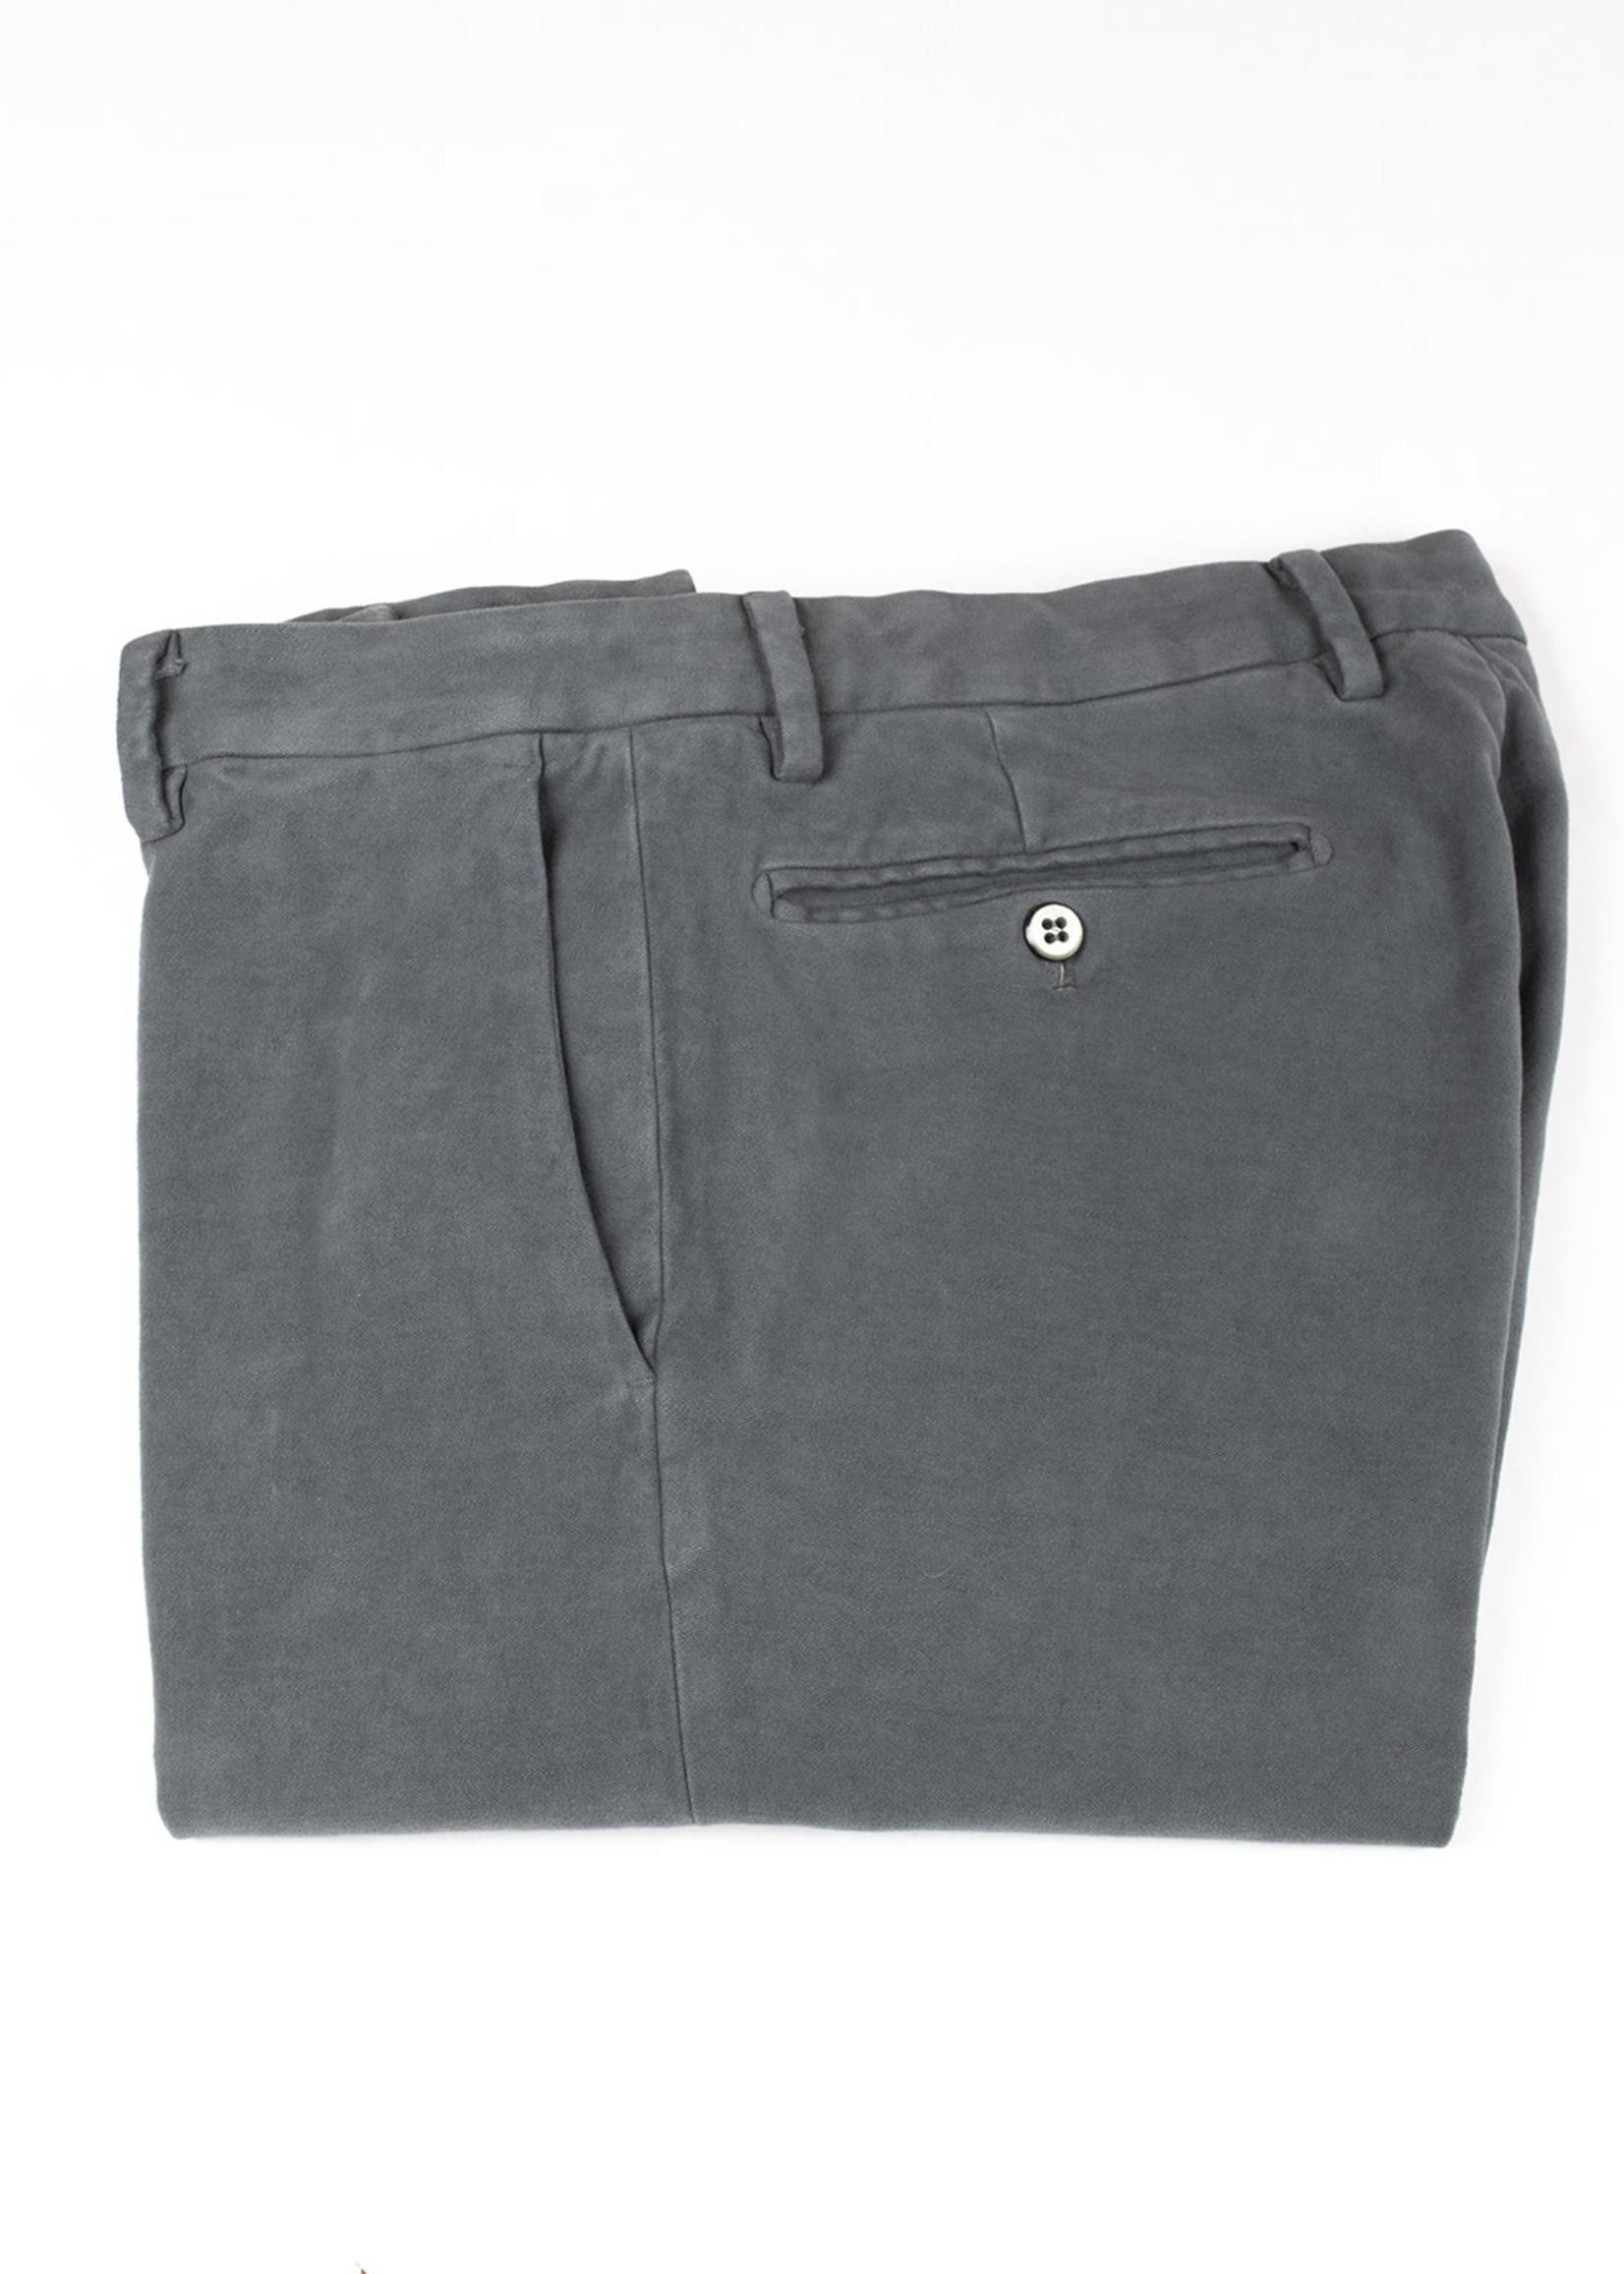 Mason's New York Gray Brushed Cotton Twill Trouser